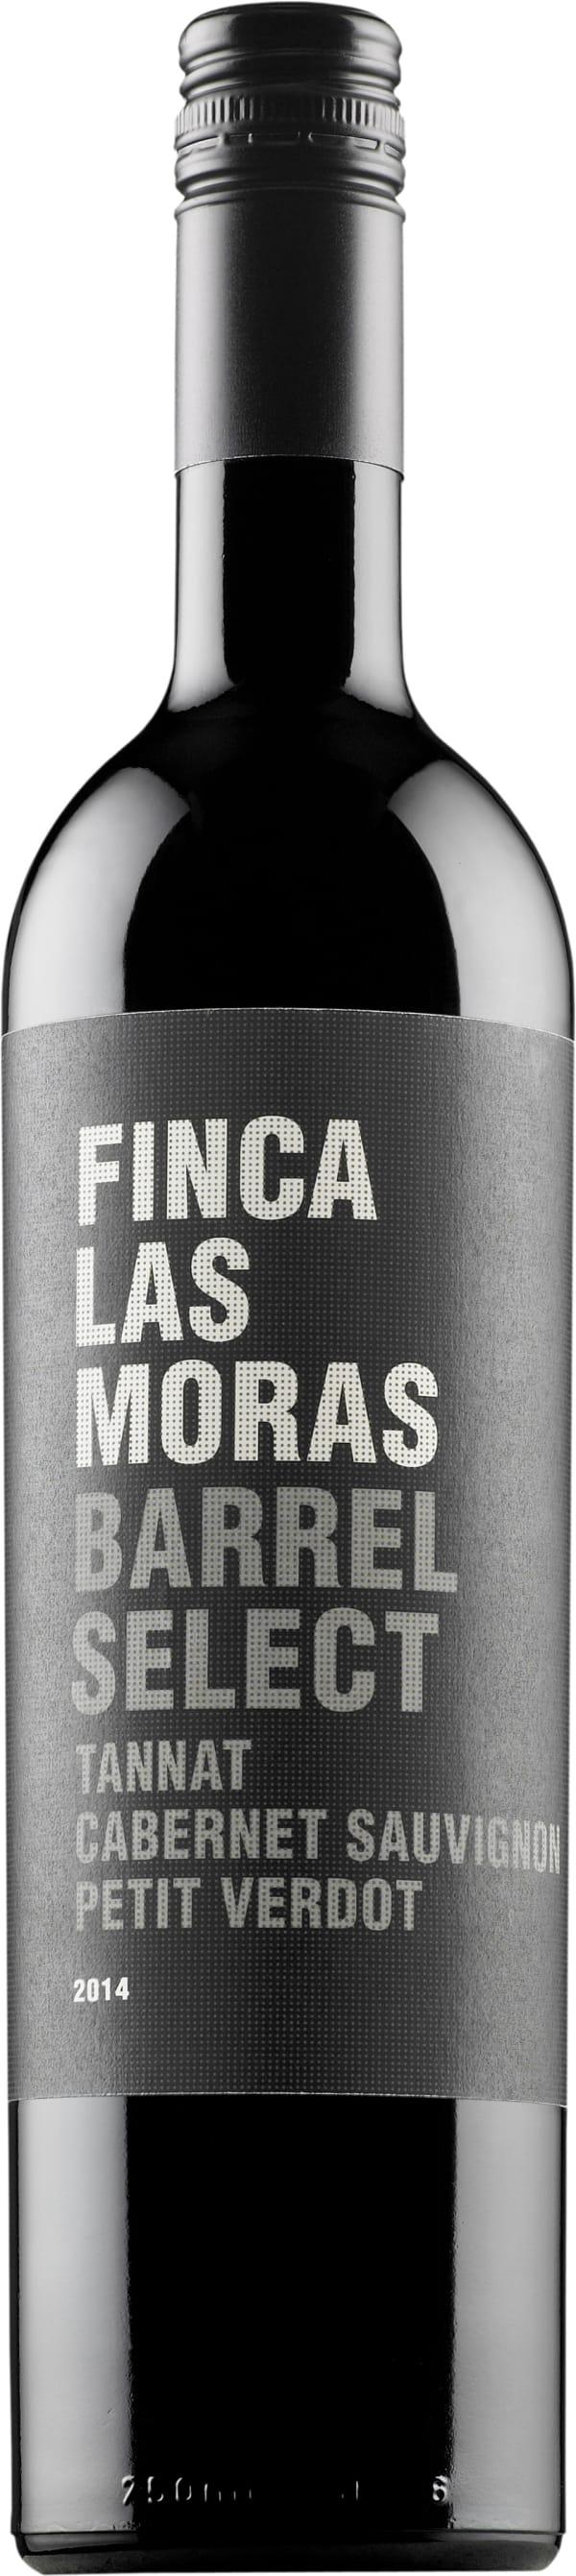 Finca Las Moras Barrel Select Tannat Cabernet Sauvignon Petit Verdot 2017